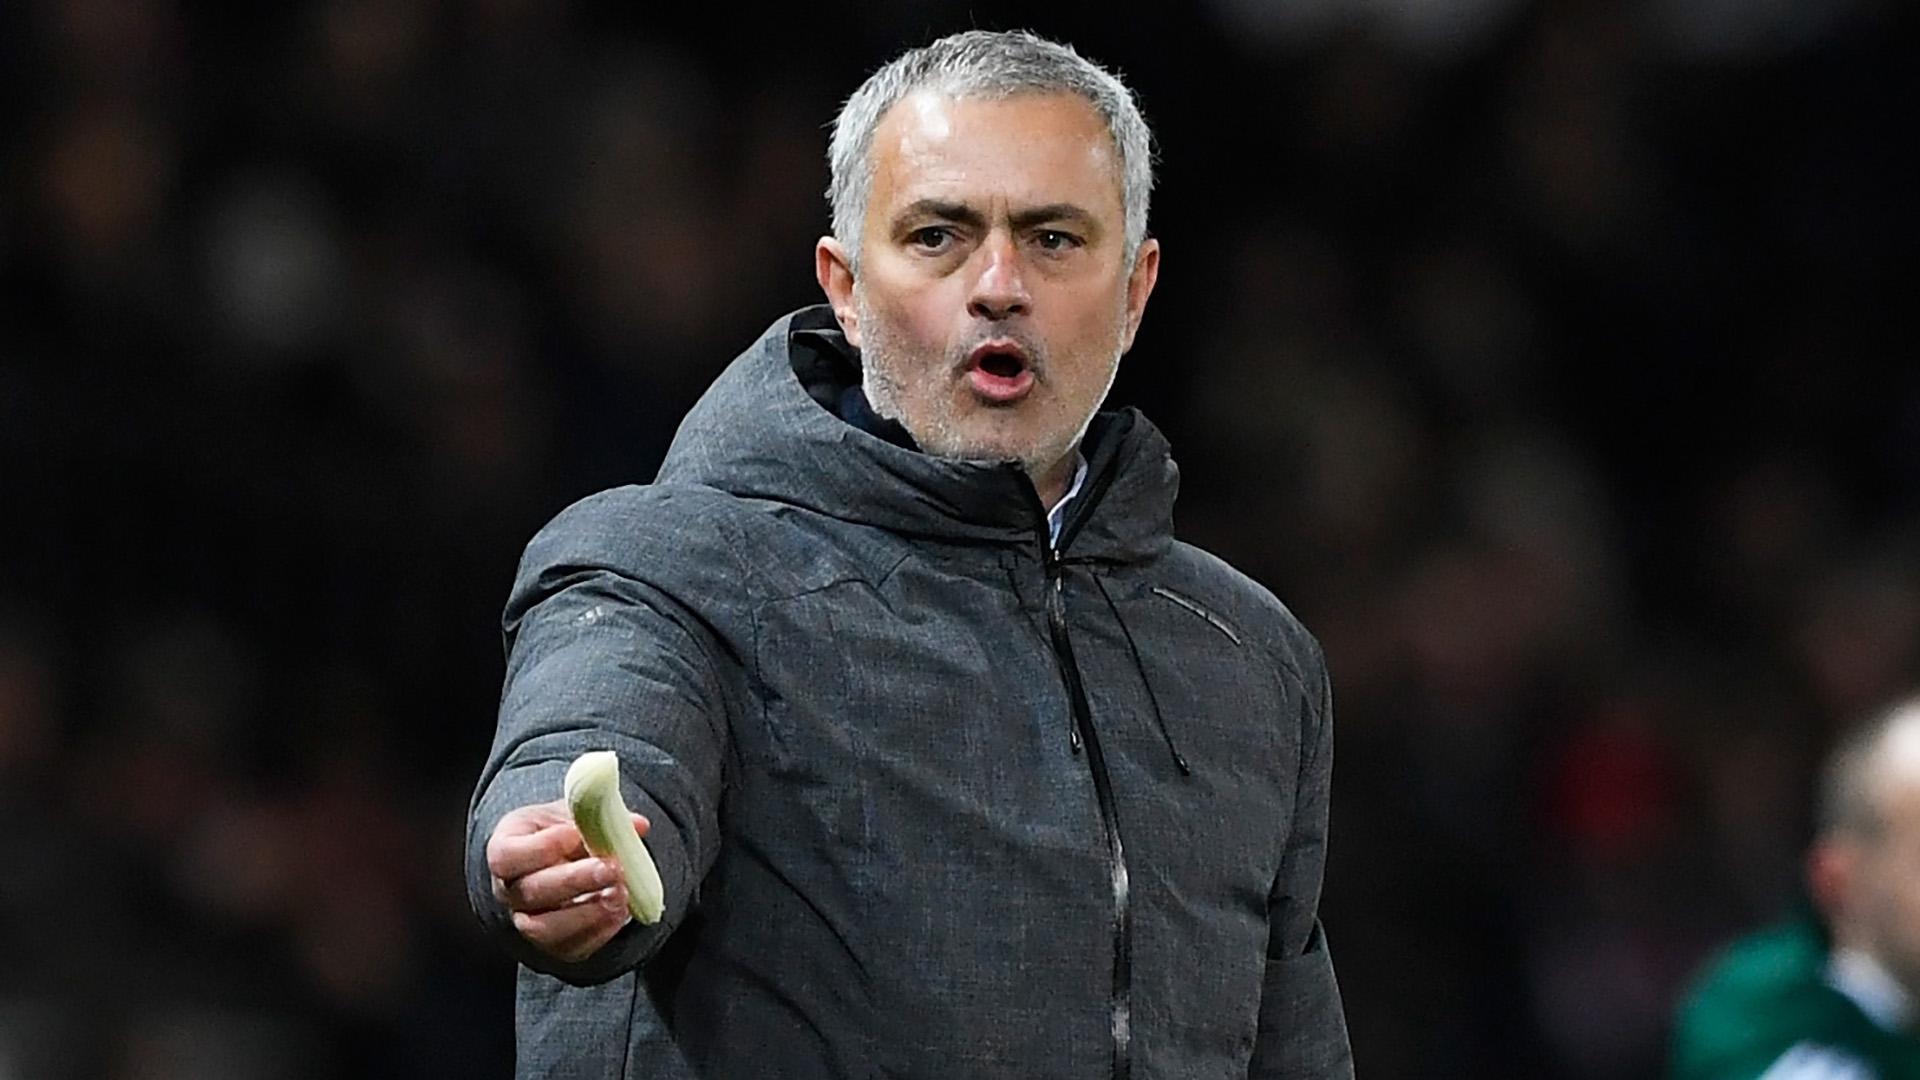 Bayern Munich - Bastian Schweinsteiger juge crédible la piste José Mourinho